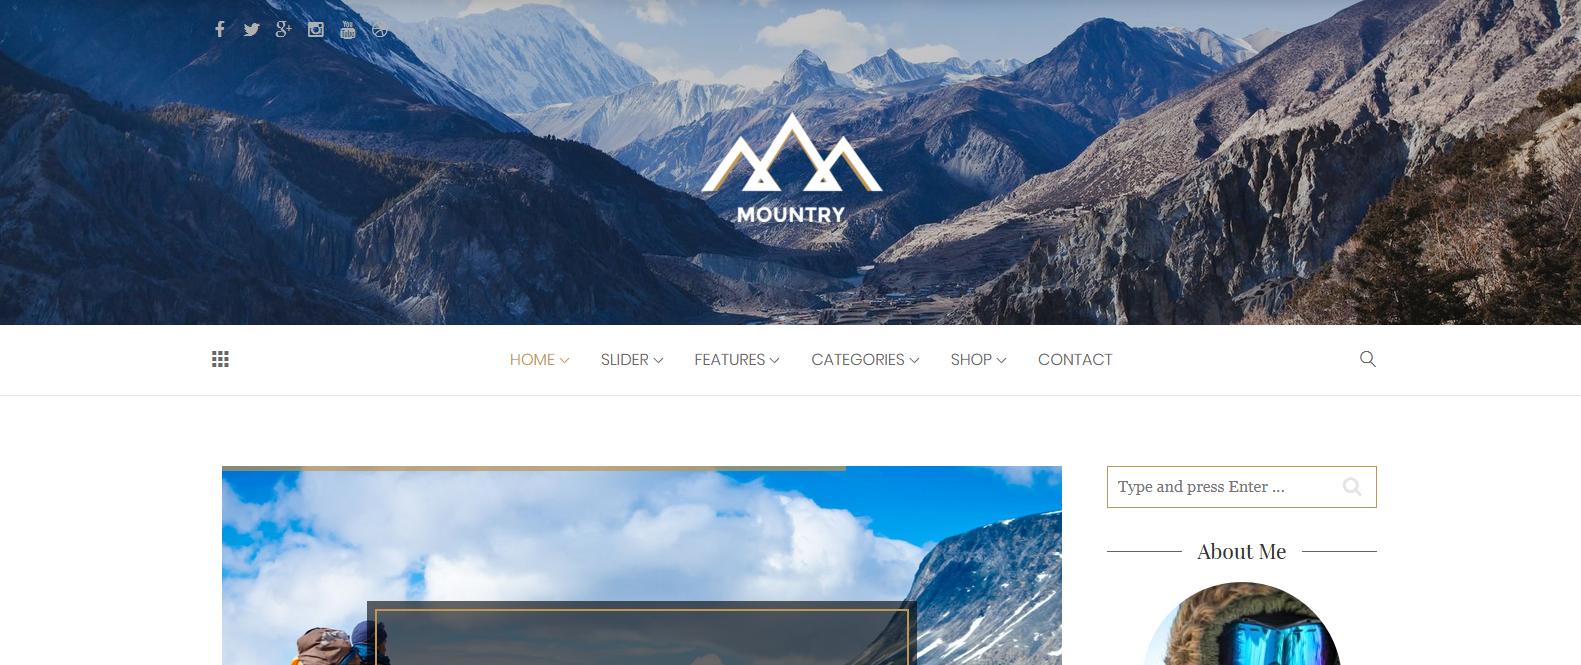 Демо-версия сайта с темой Mountry